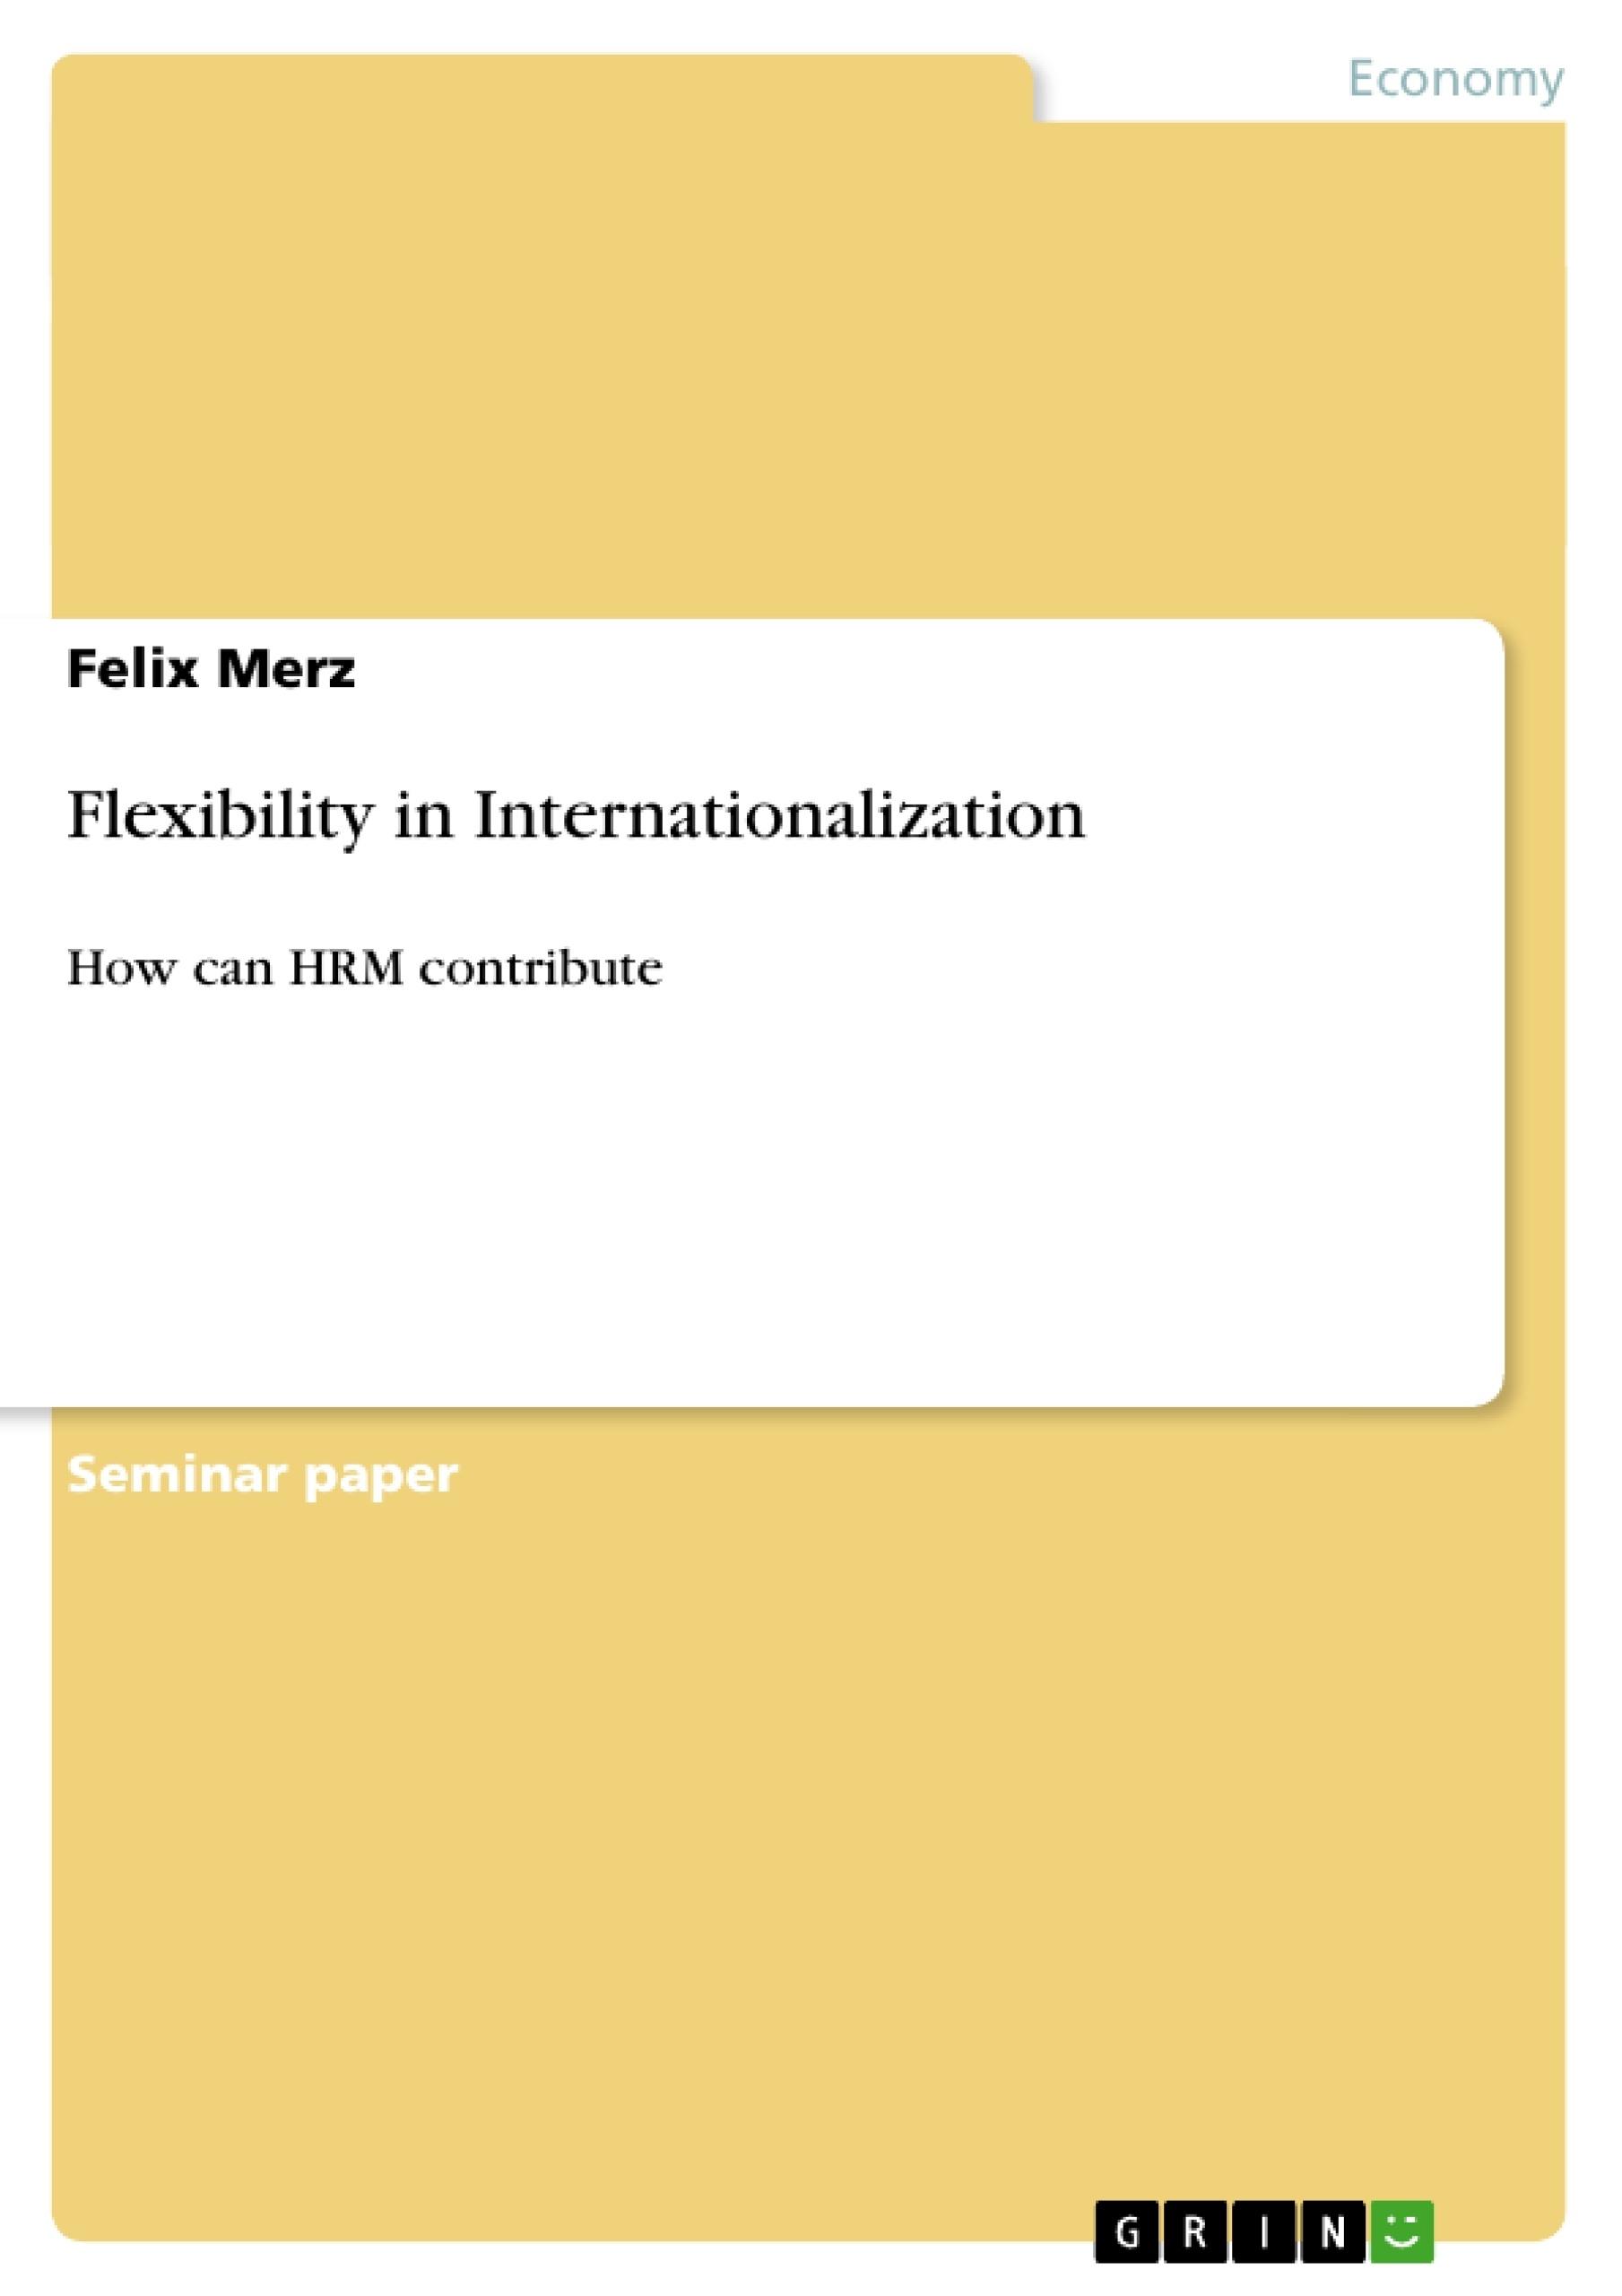 Title: Flexibility in Internationalization